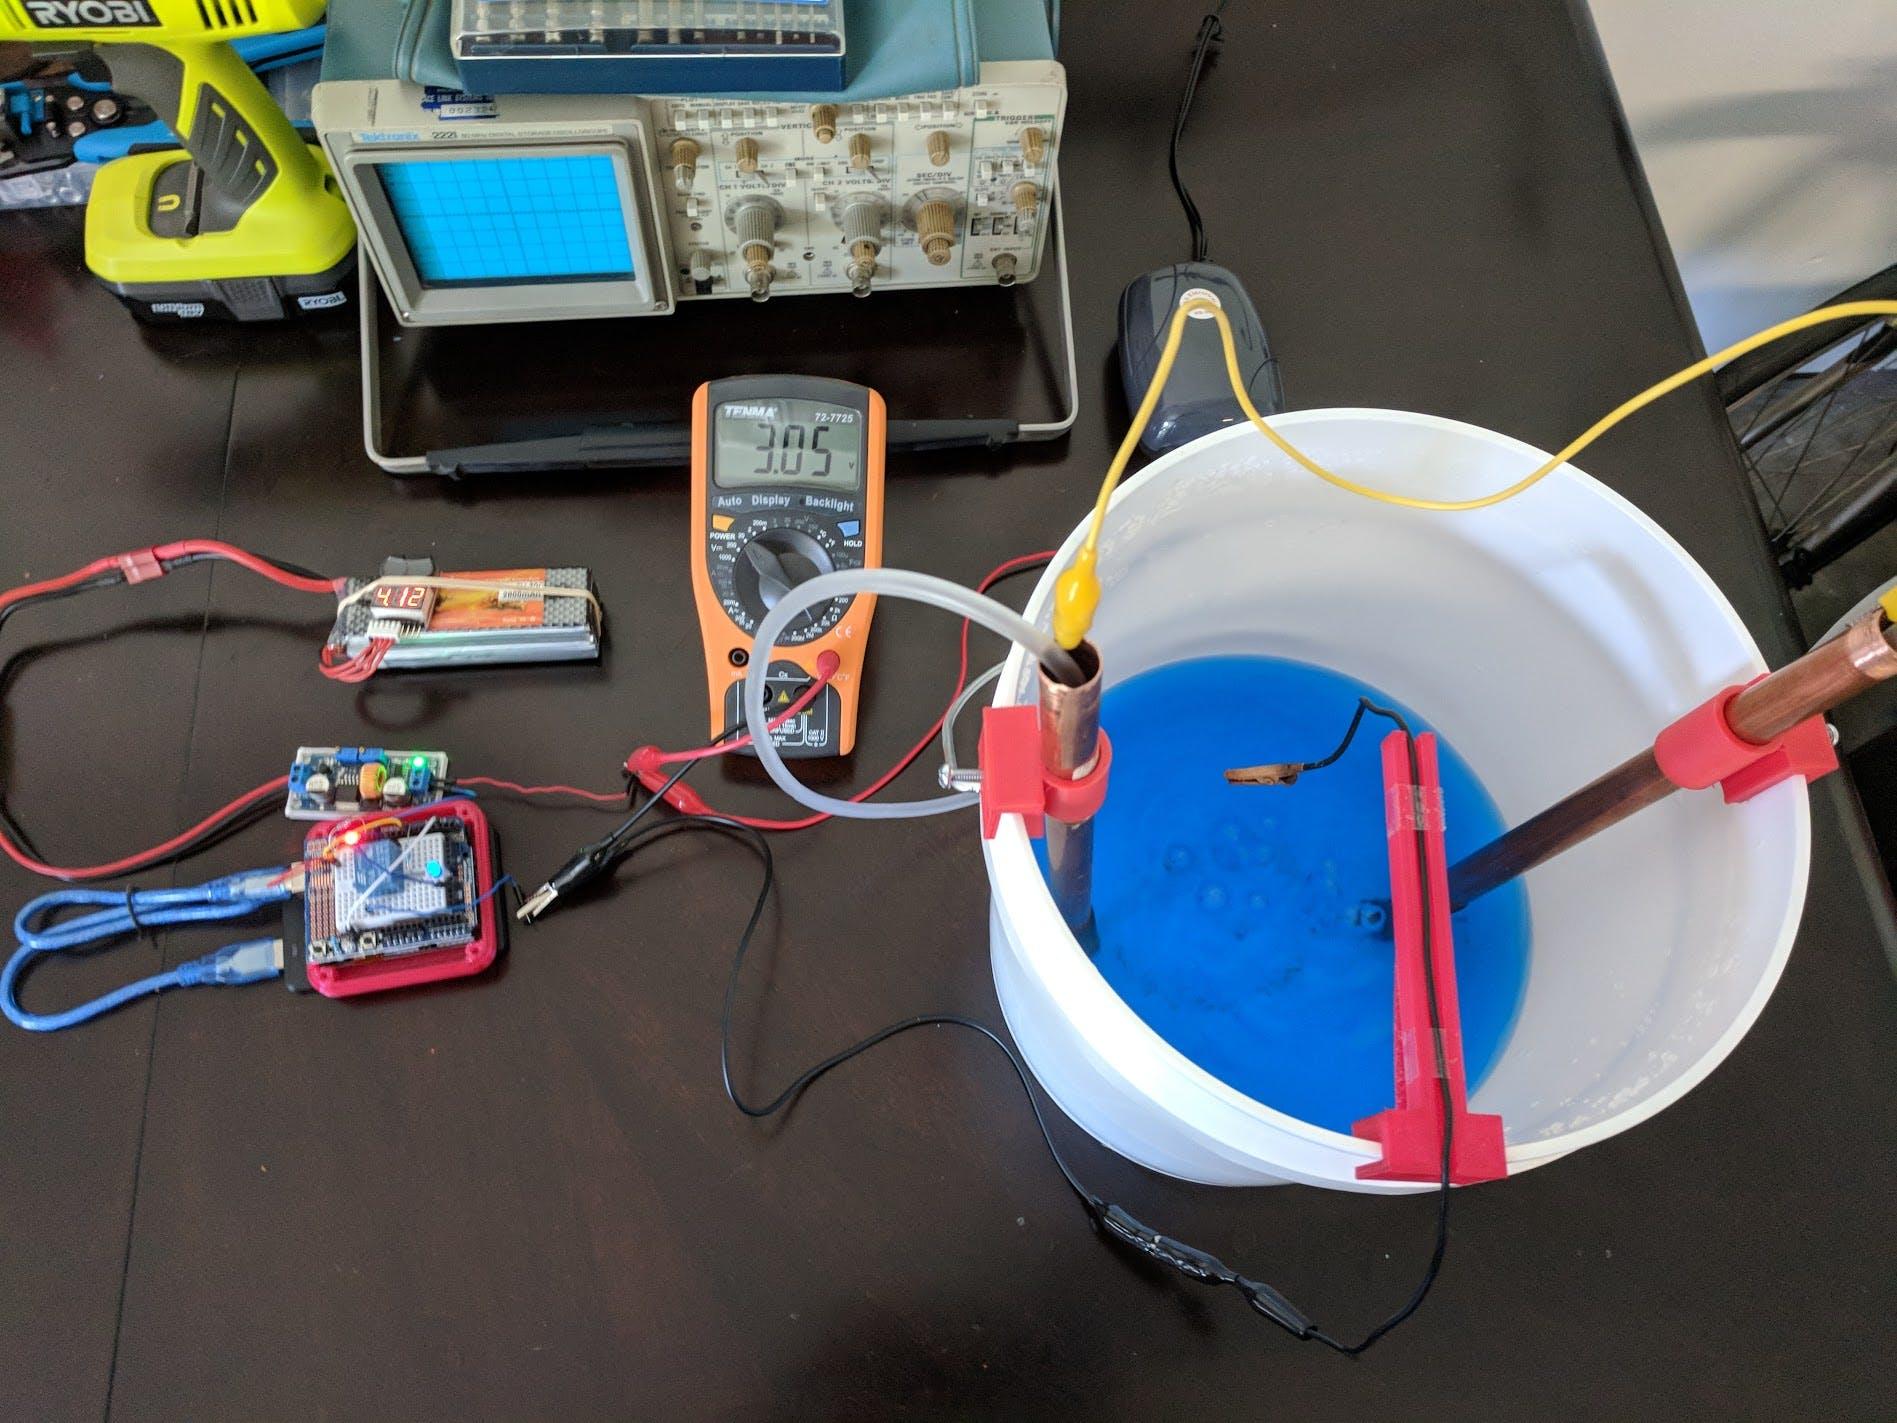 Electroplating system